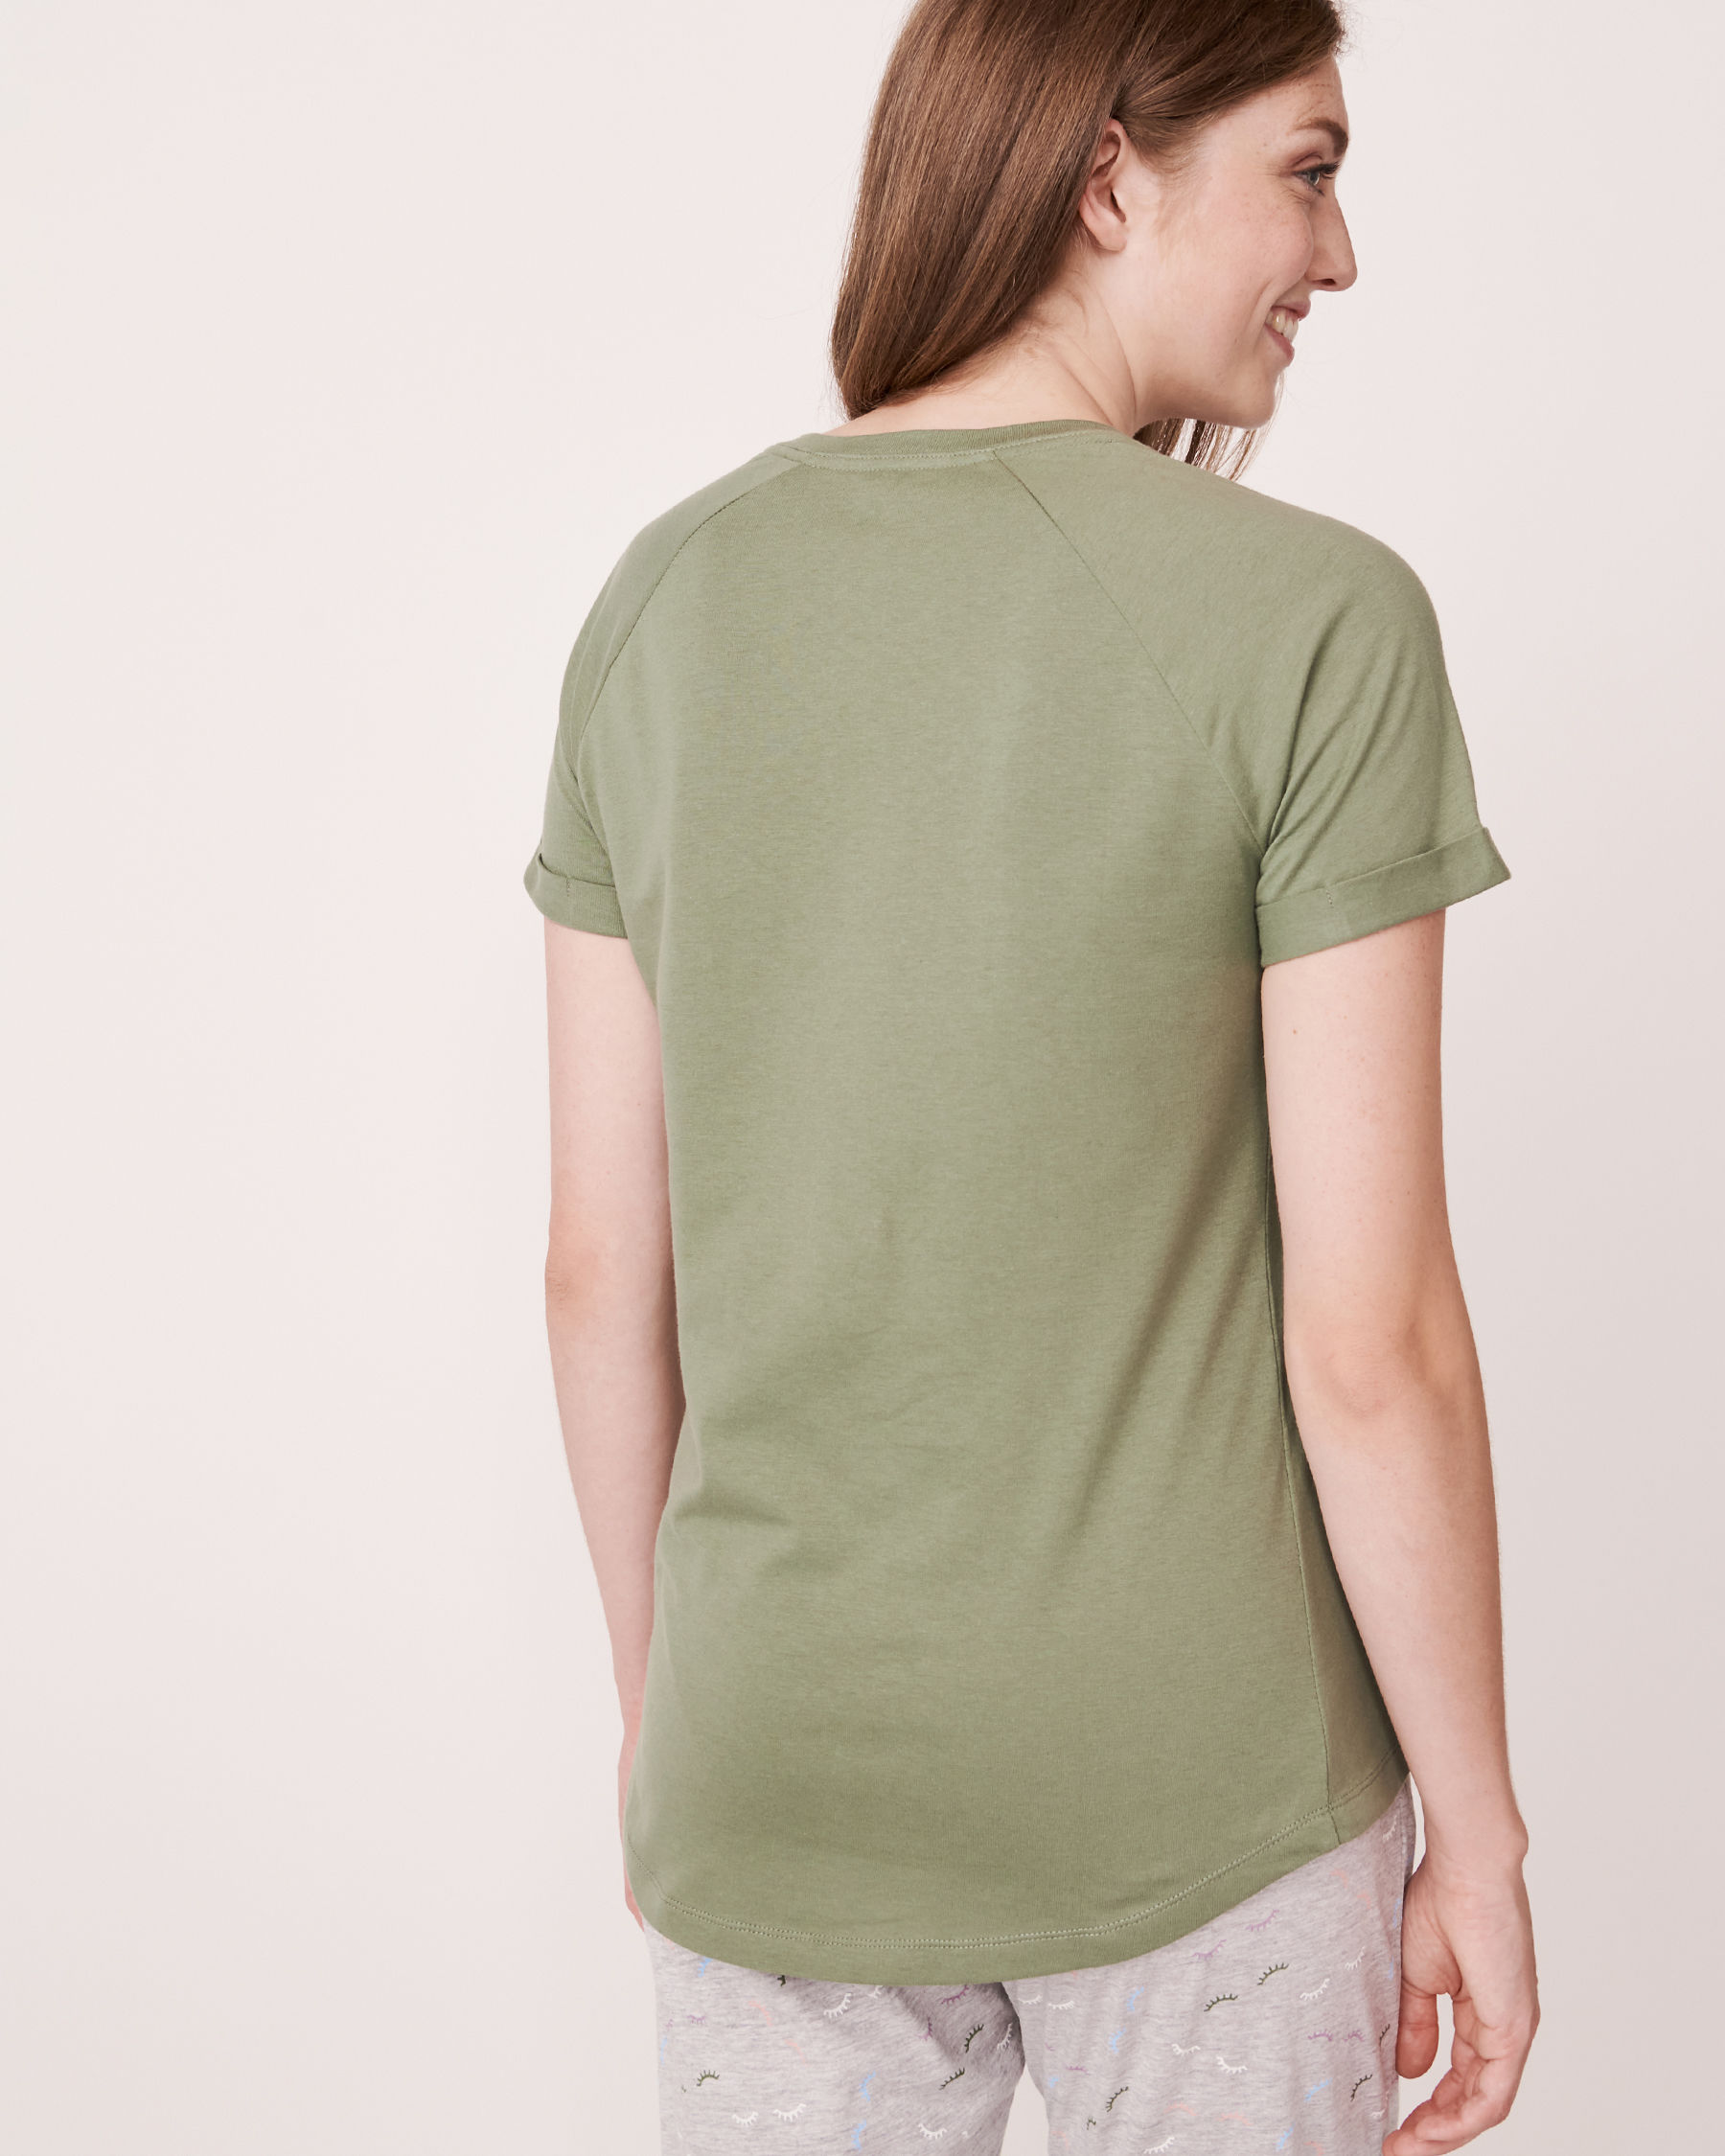 LA VIE EN ROSE Raglan Short Sleeves Shirt Khaki 880-386-1-11 - View2